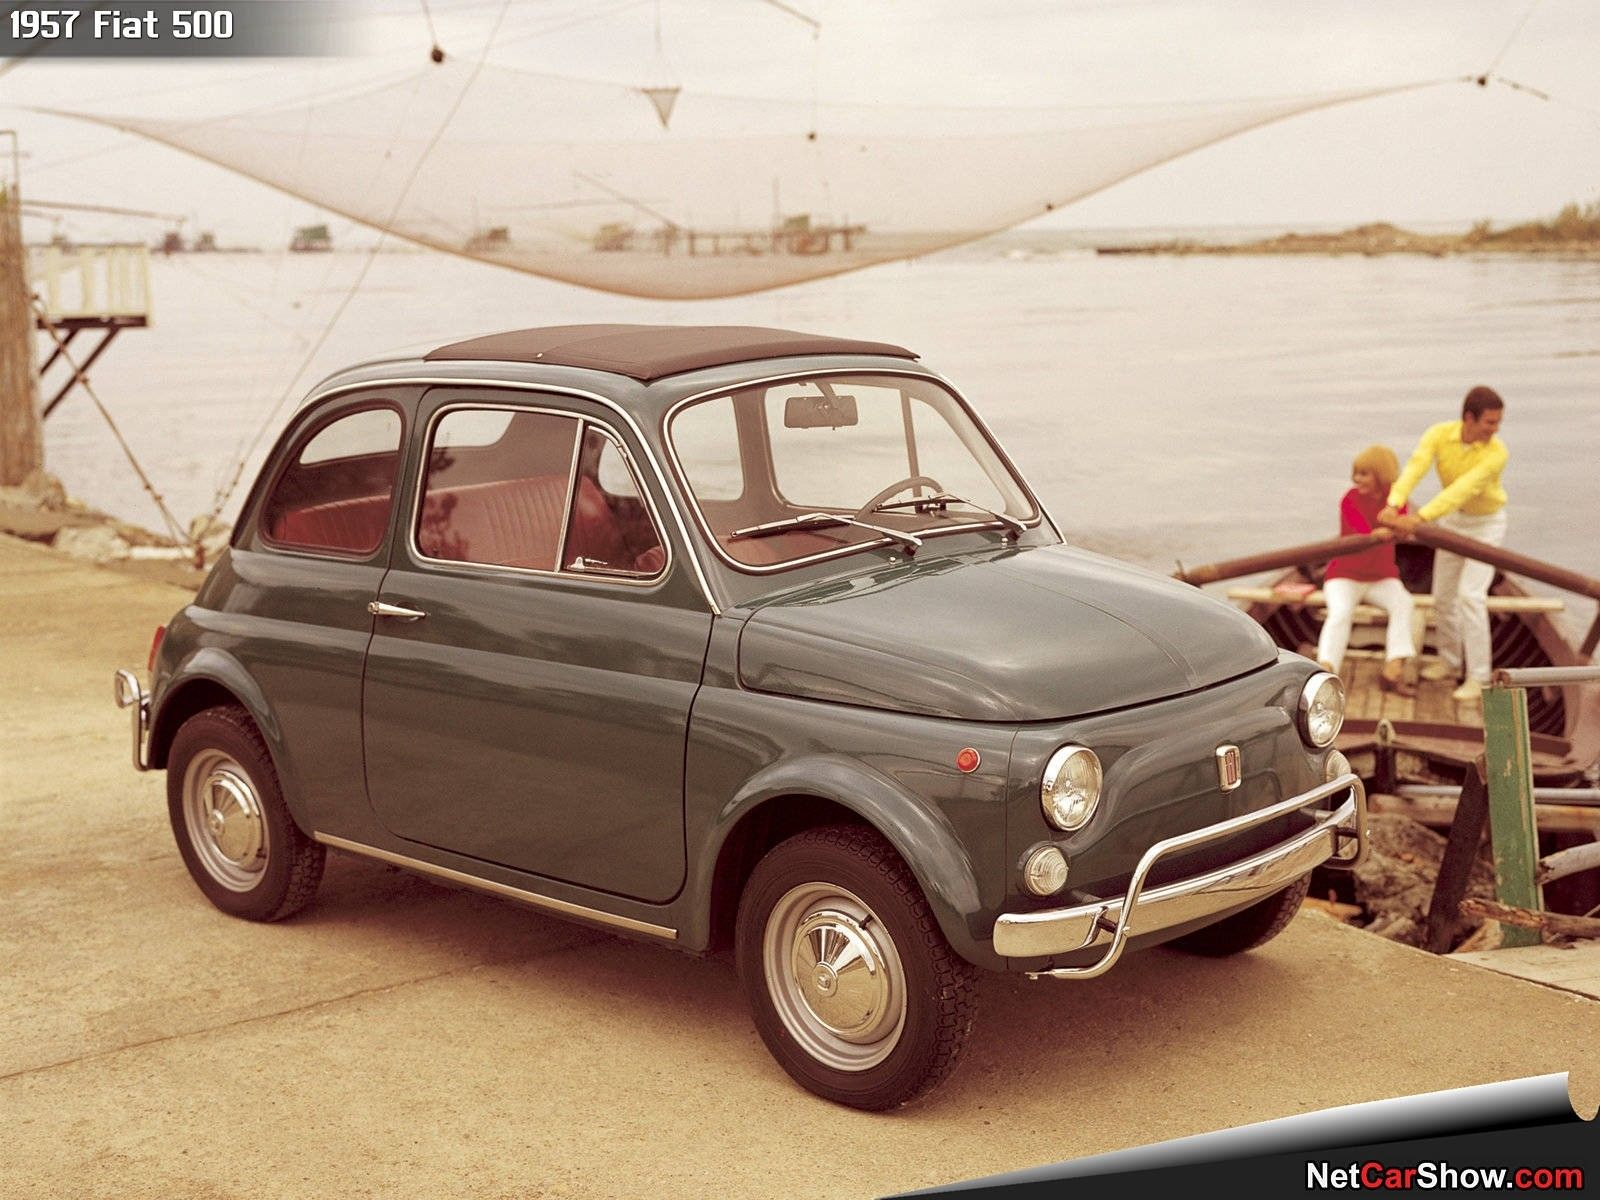 Fiat 500 1957 | Fiat 500 | Pinterest | Fiat and Cars